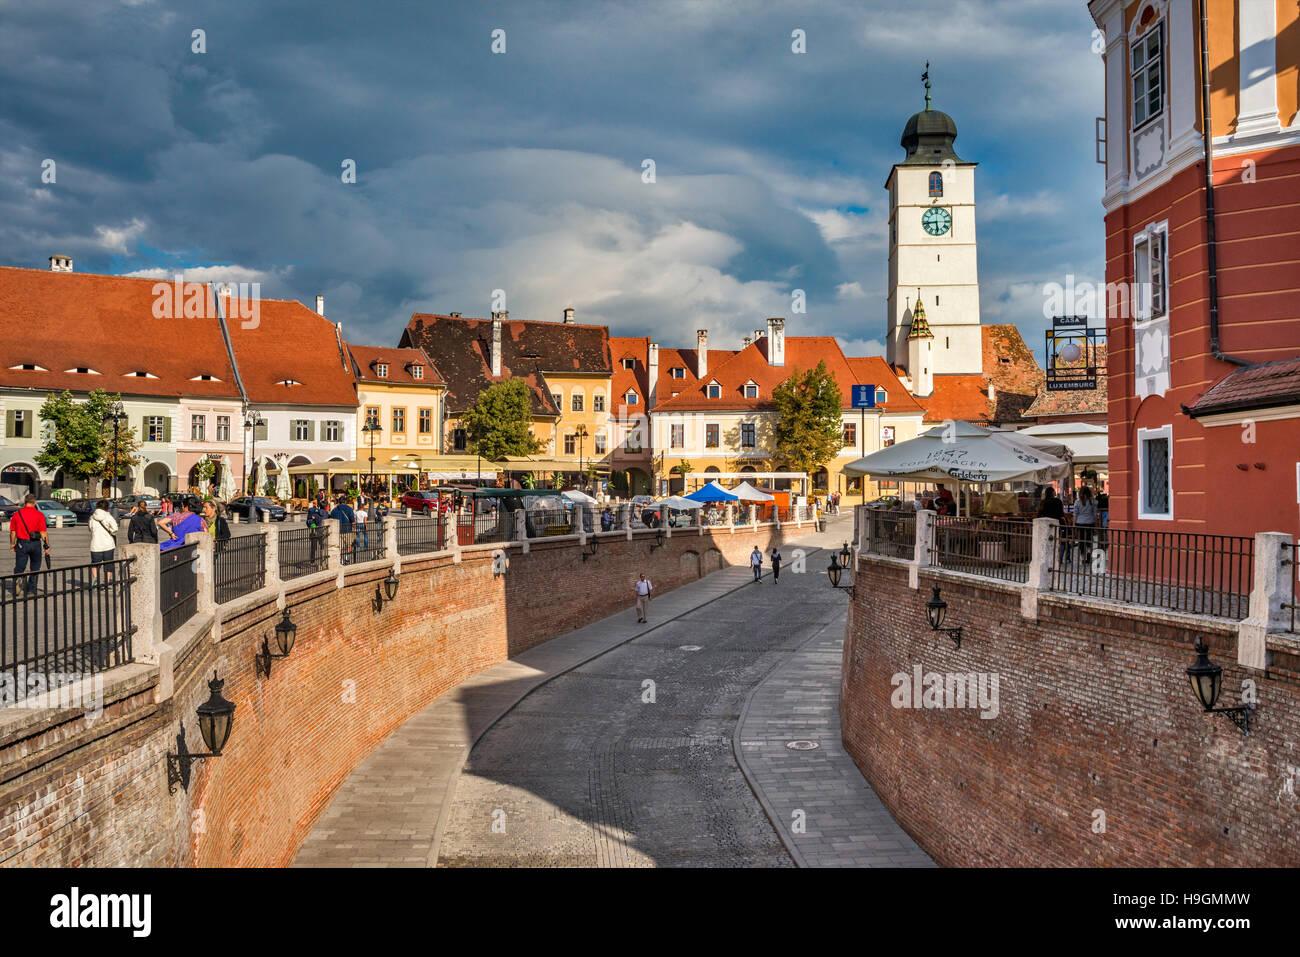 Passage to Lower Town, City Hall Tower (Turnul Sfatului), from Liars Bridge (Podul Minciunilor) in Sibiu, Transylvania, - Stock Image